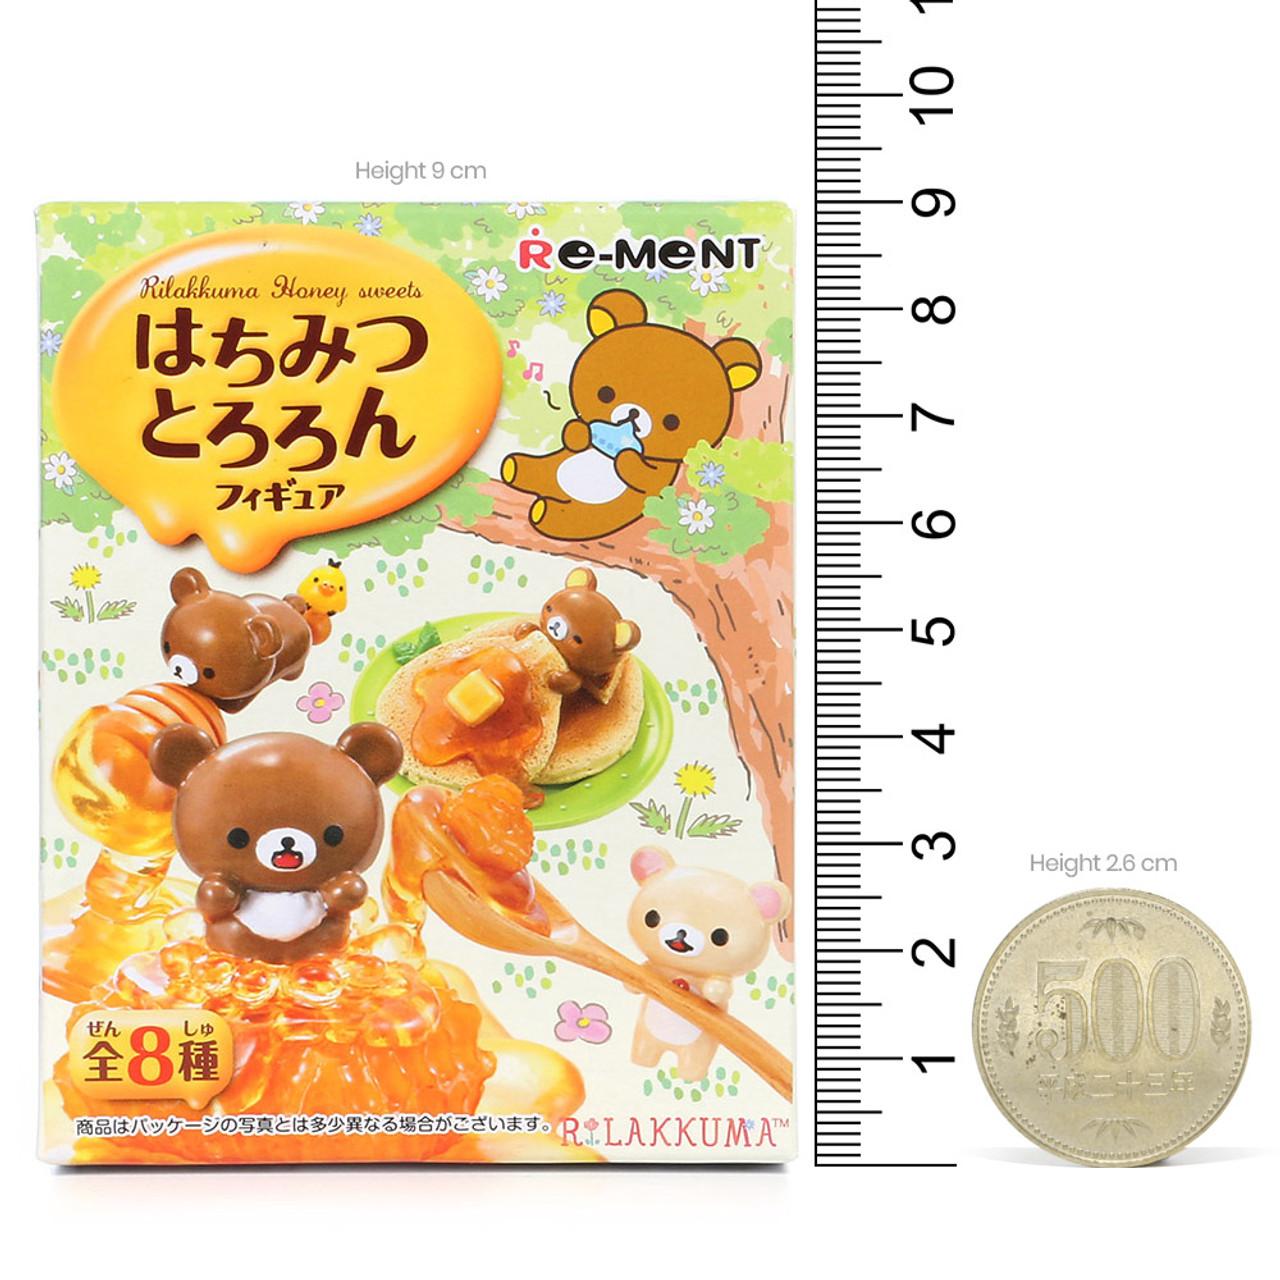 Rilakkuma Blind Box Figure - Honey Sweets ( Proportion )